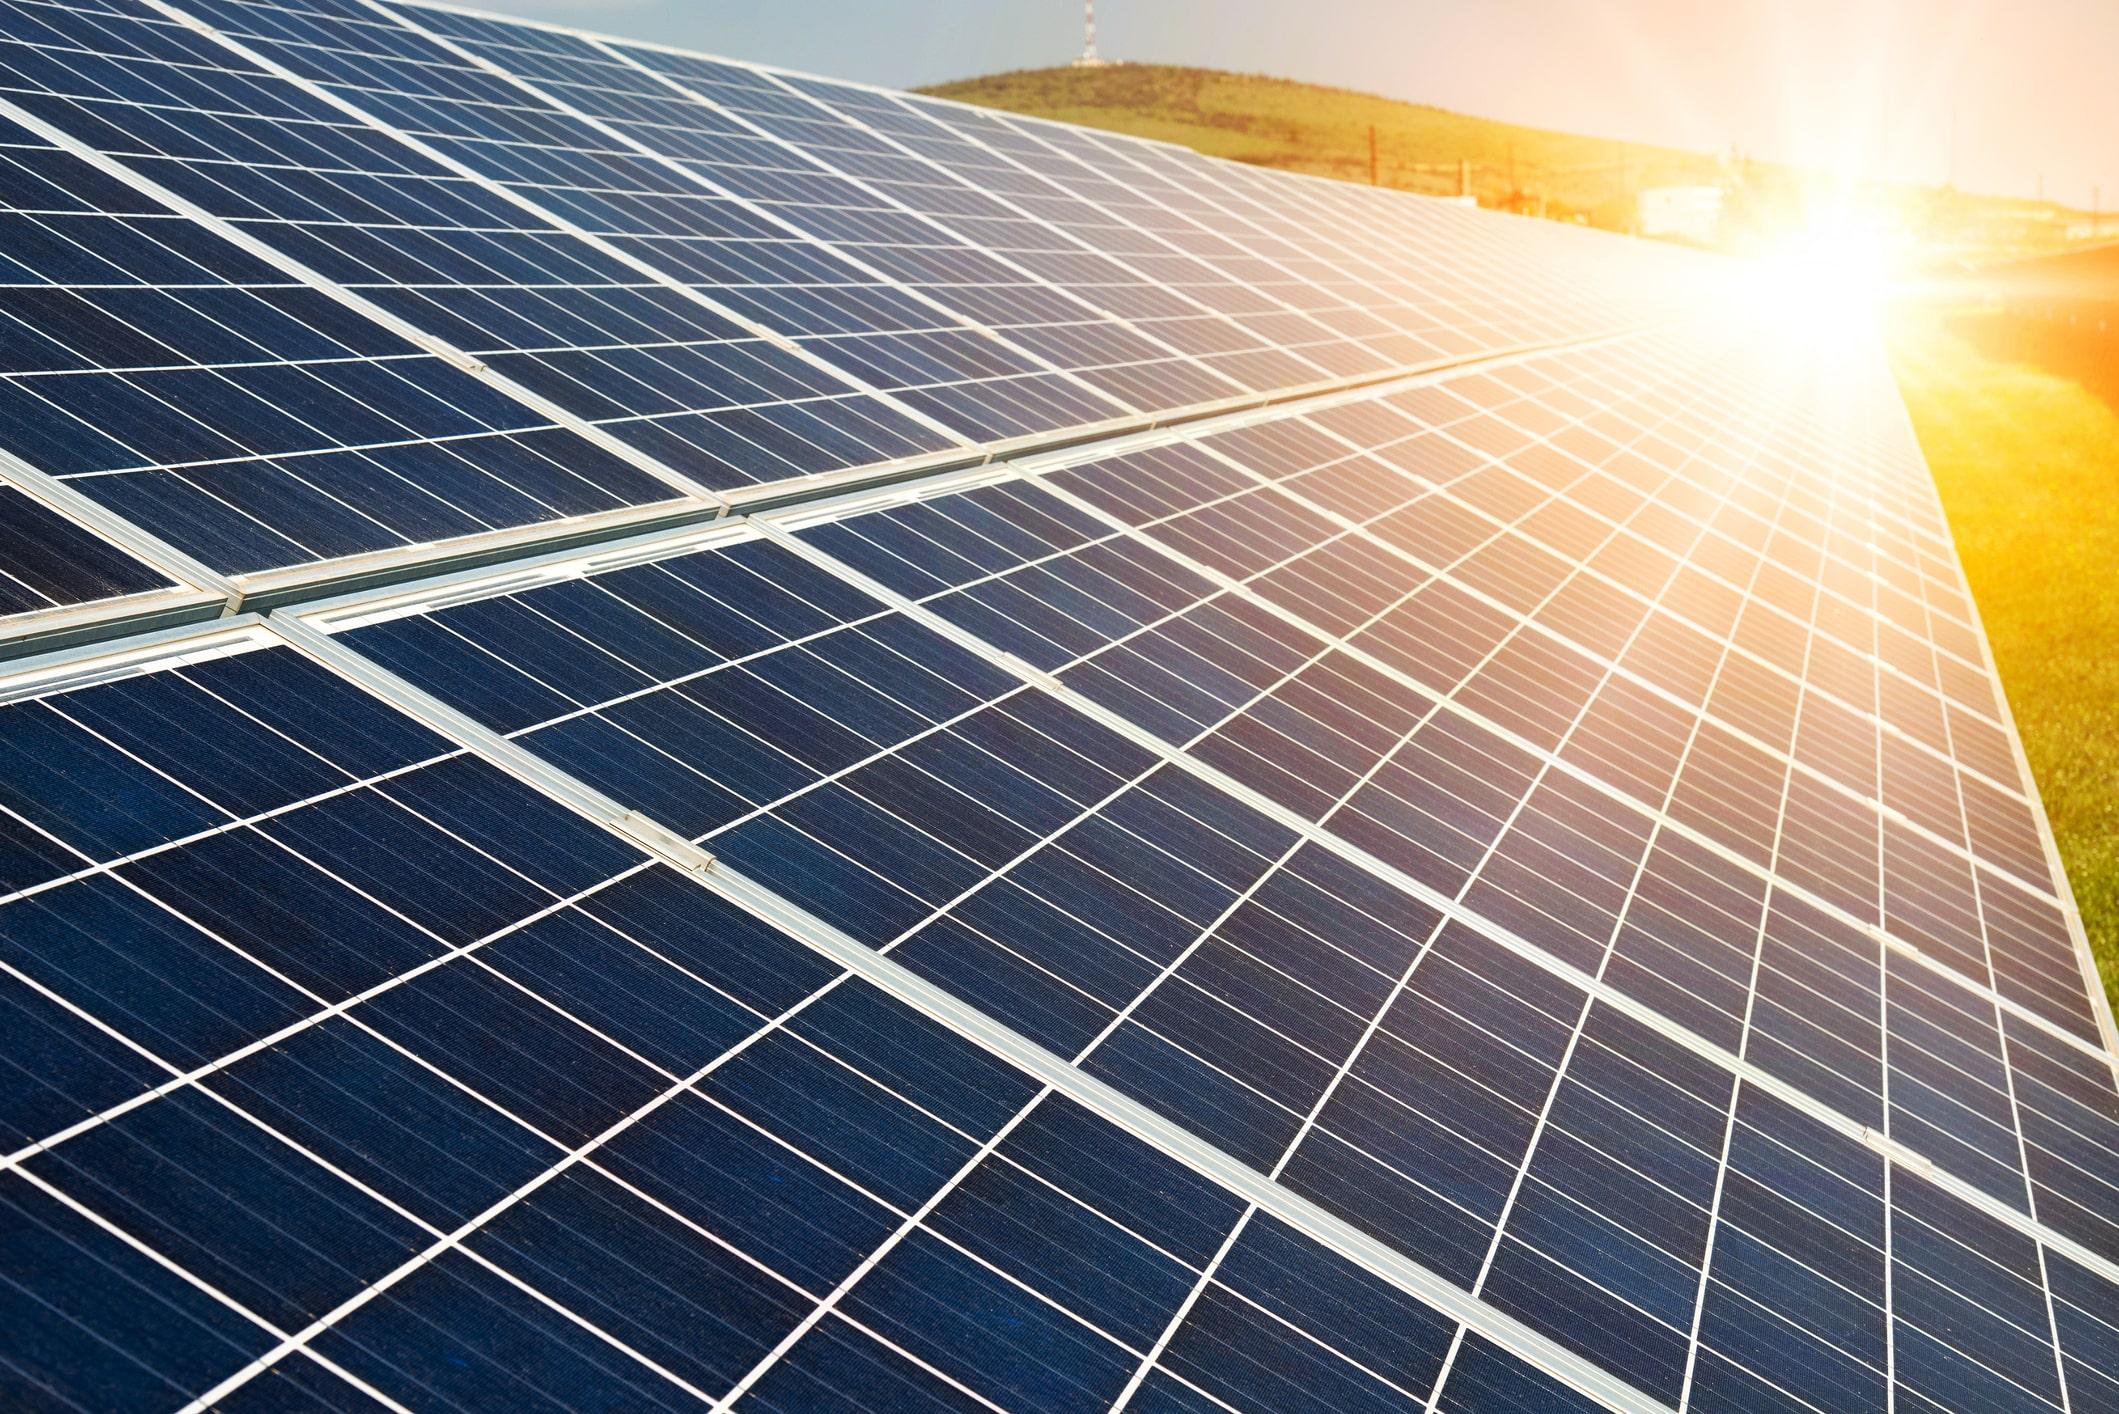 sun gleaming on solar panels